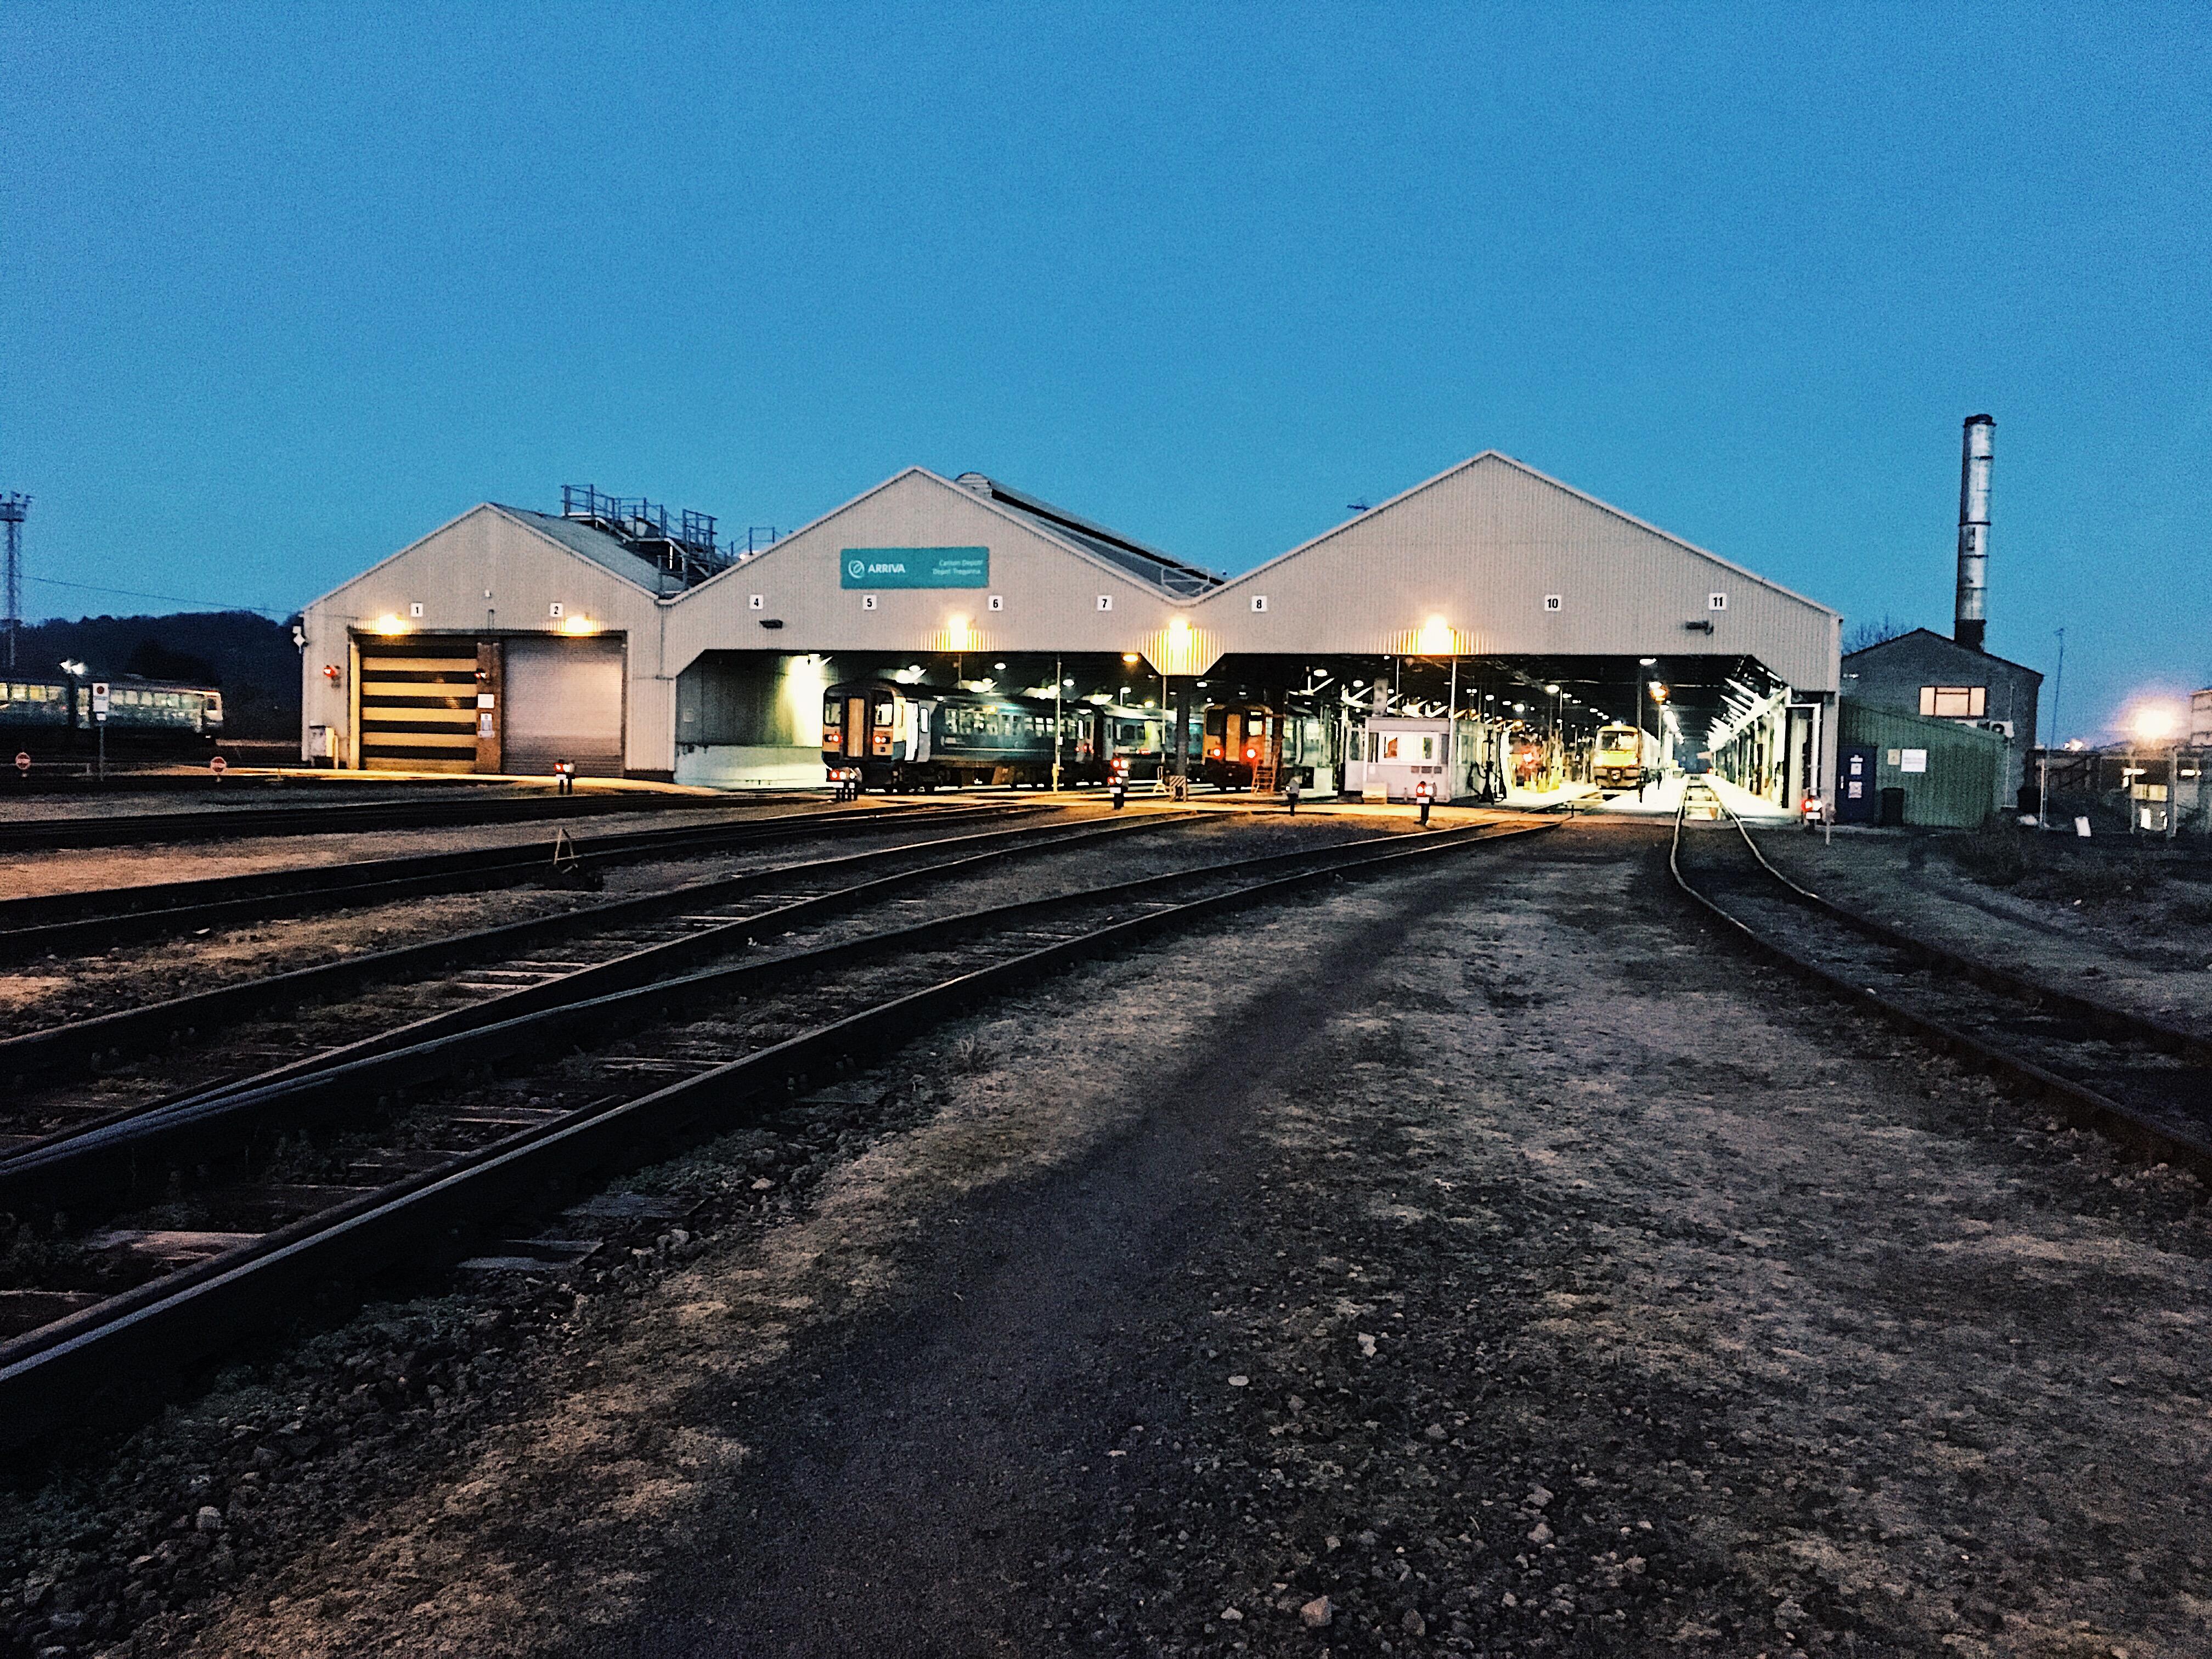 CIRAS - Communications improve at Canton Depot